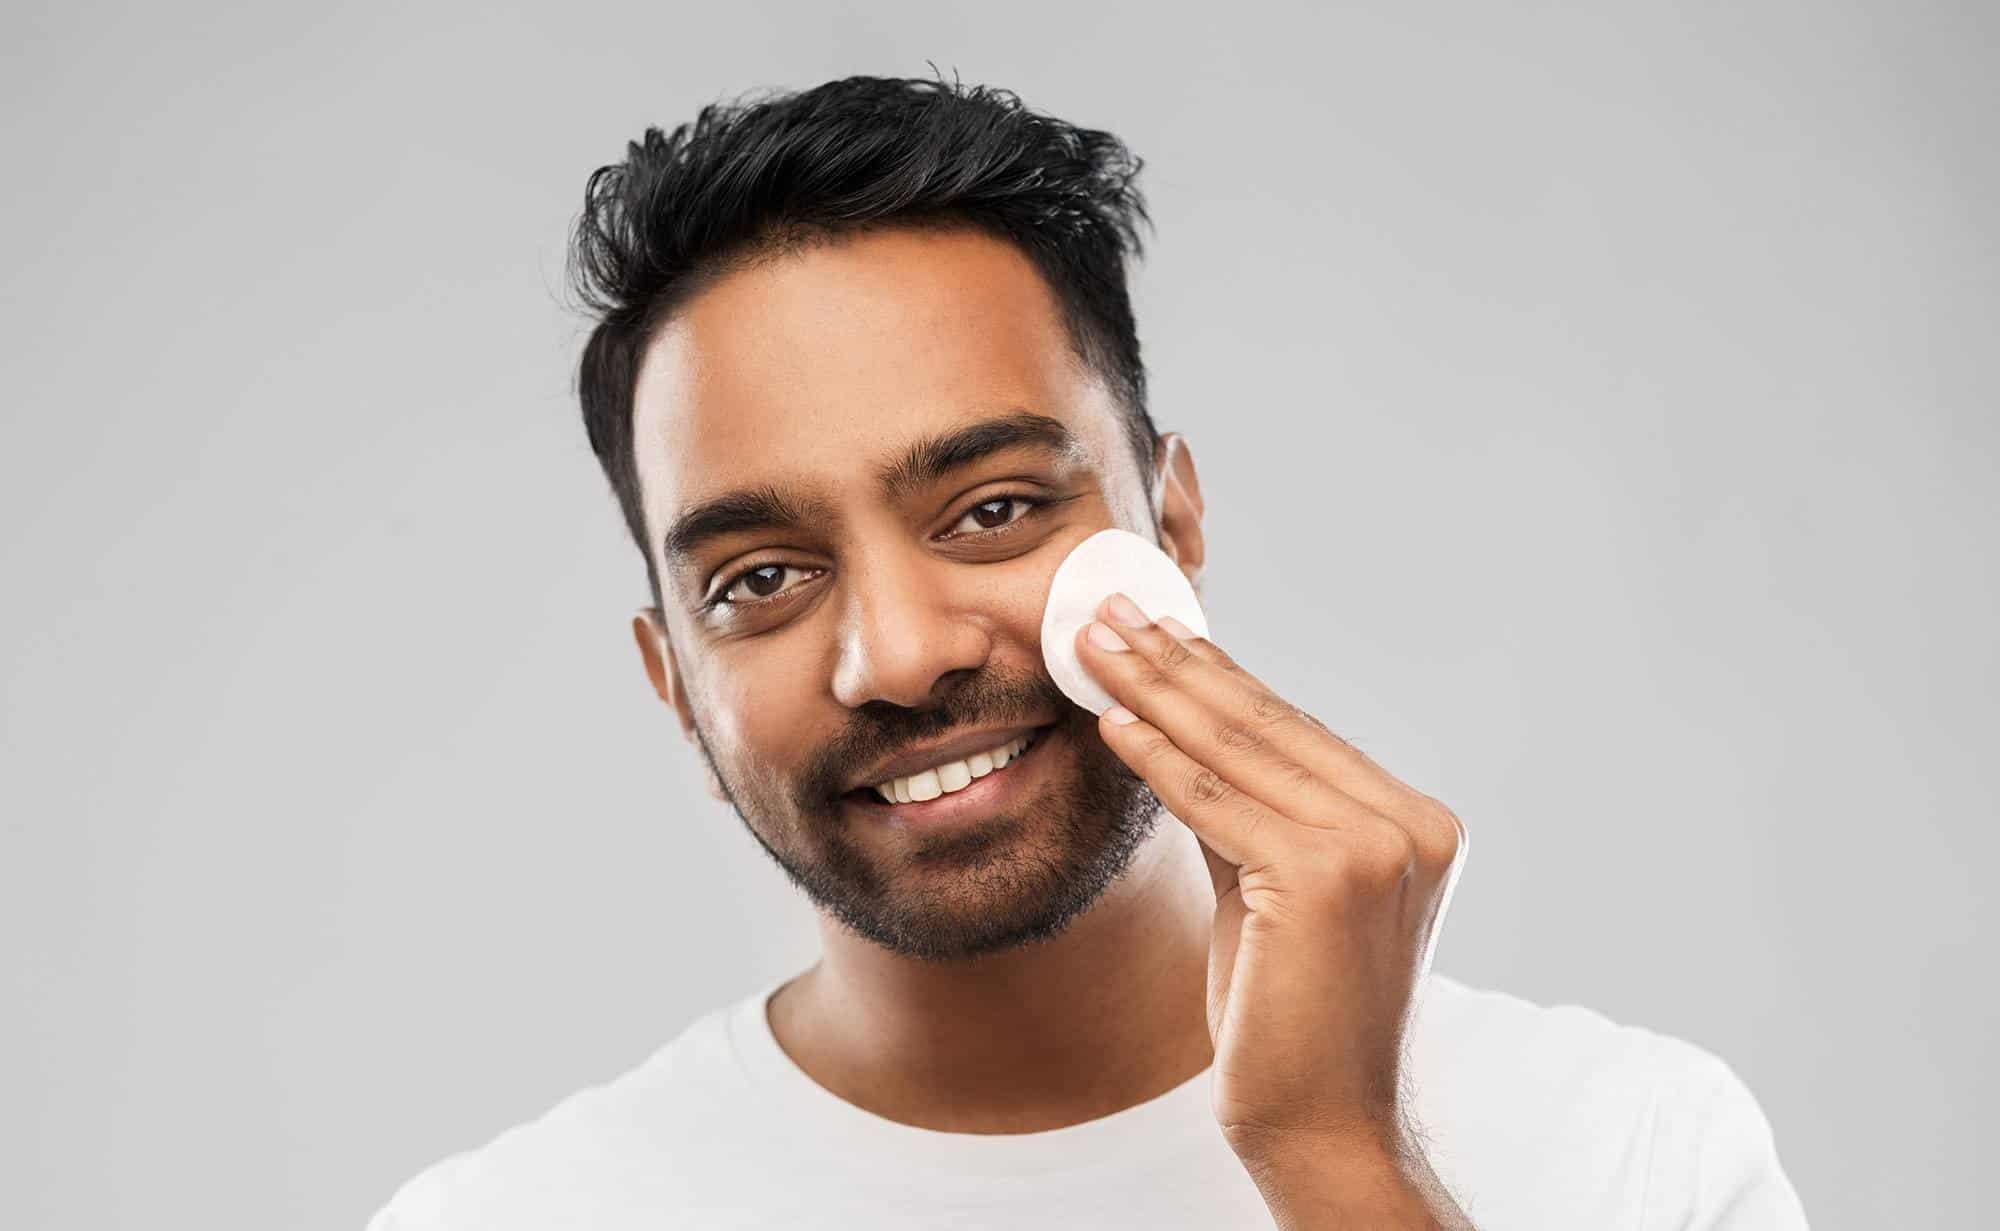 10 tips to increase beard density